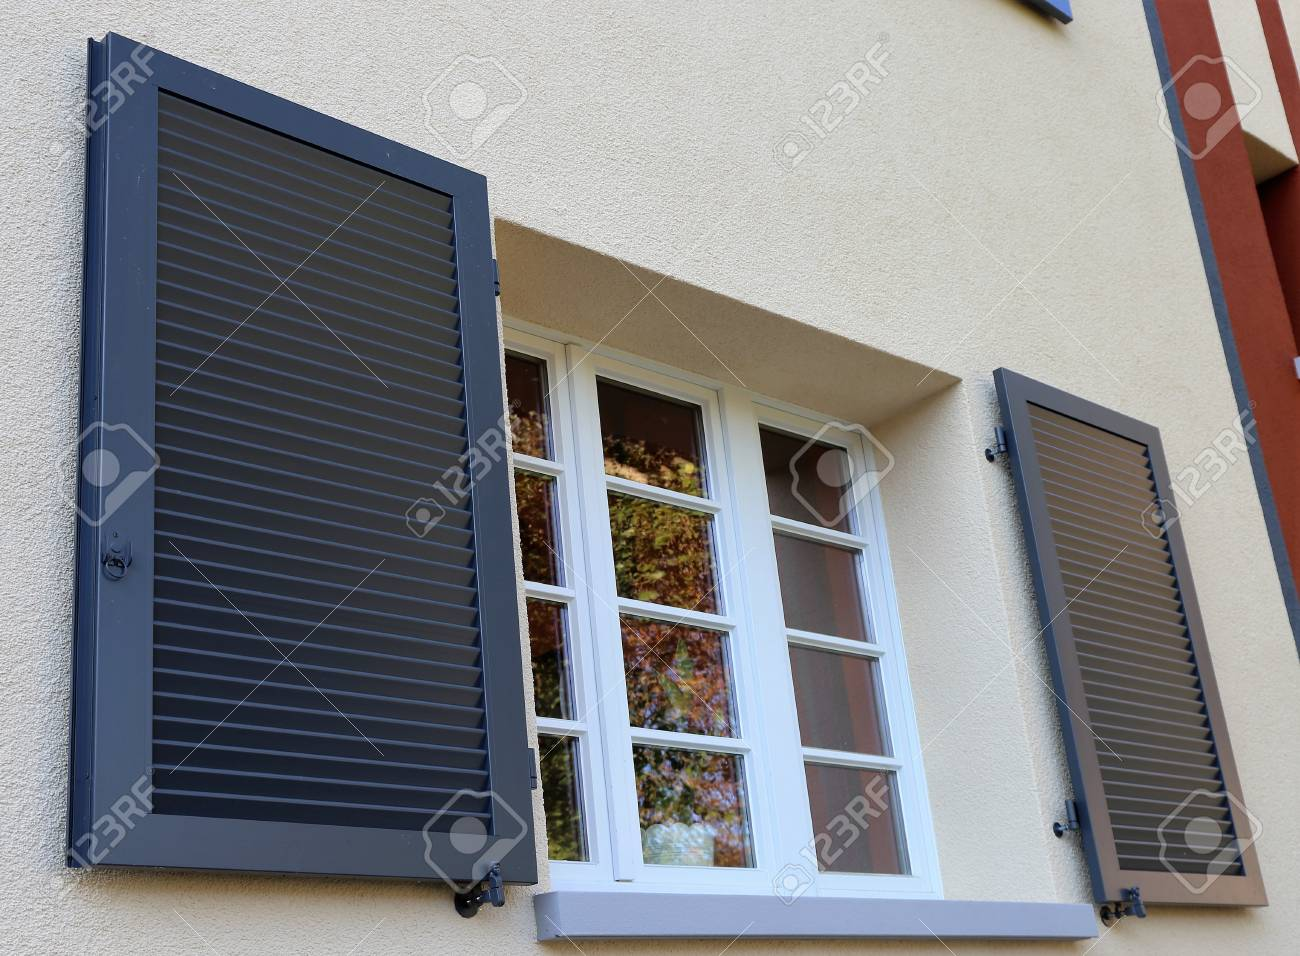 Window With Wooden Shutter Exterior Shot